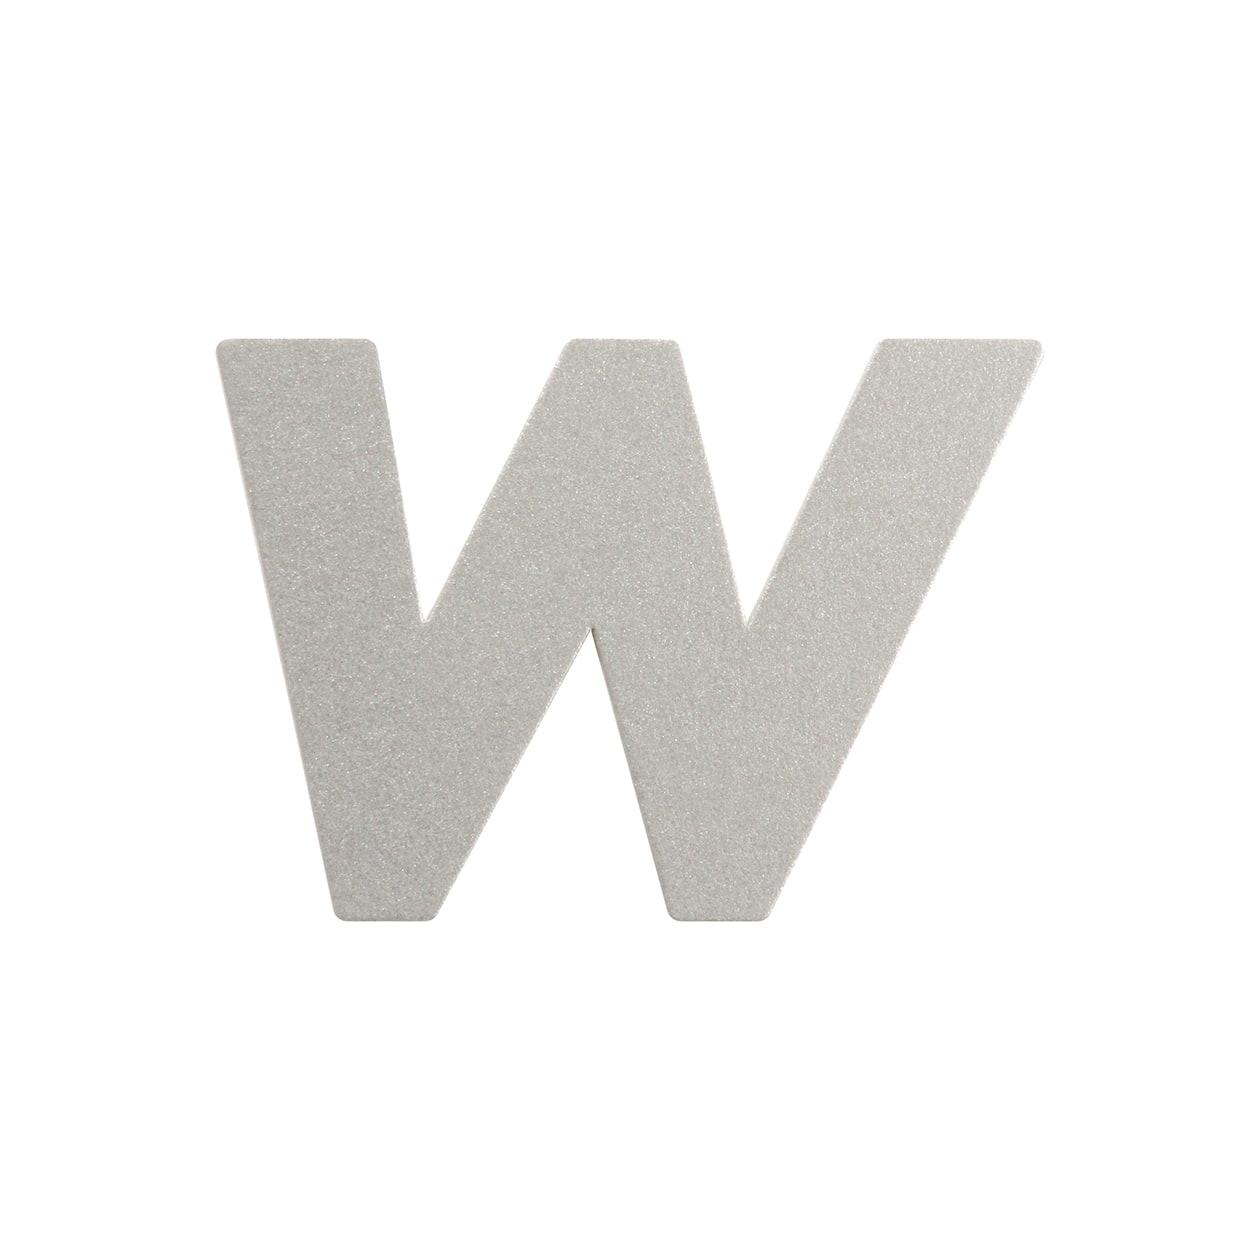 No.395ボード A7カードDC 文字W シルバー